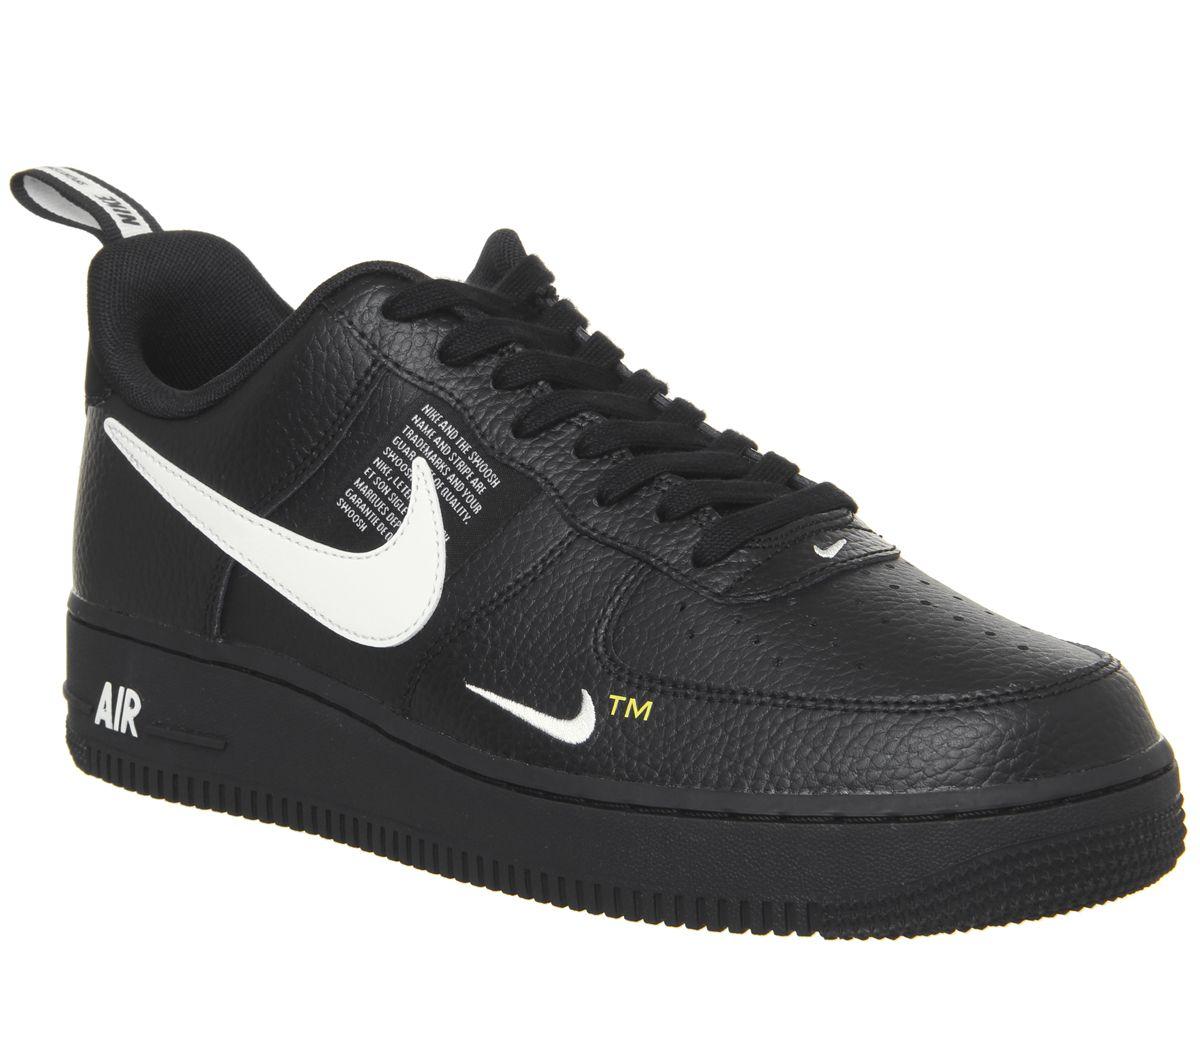 80663c1e2415de Nike Air Force 1 Utility Trainers Black White Black Tour Yellow ...